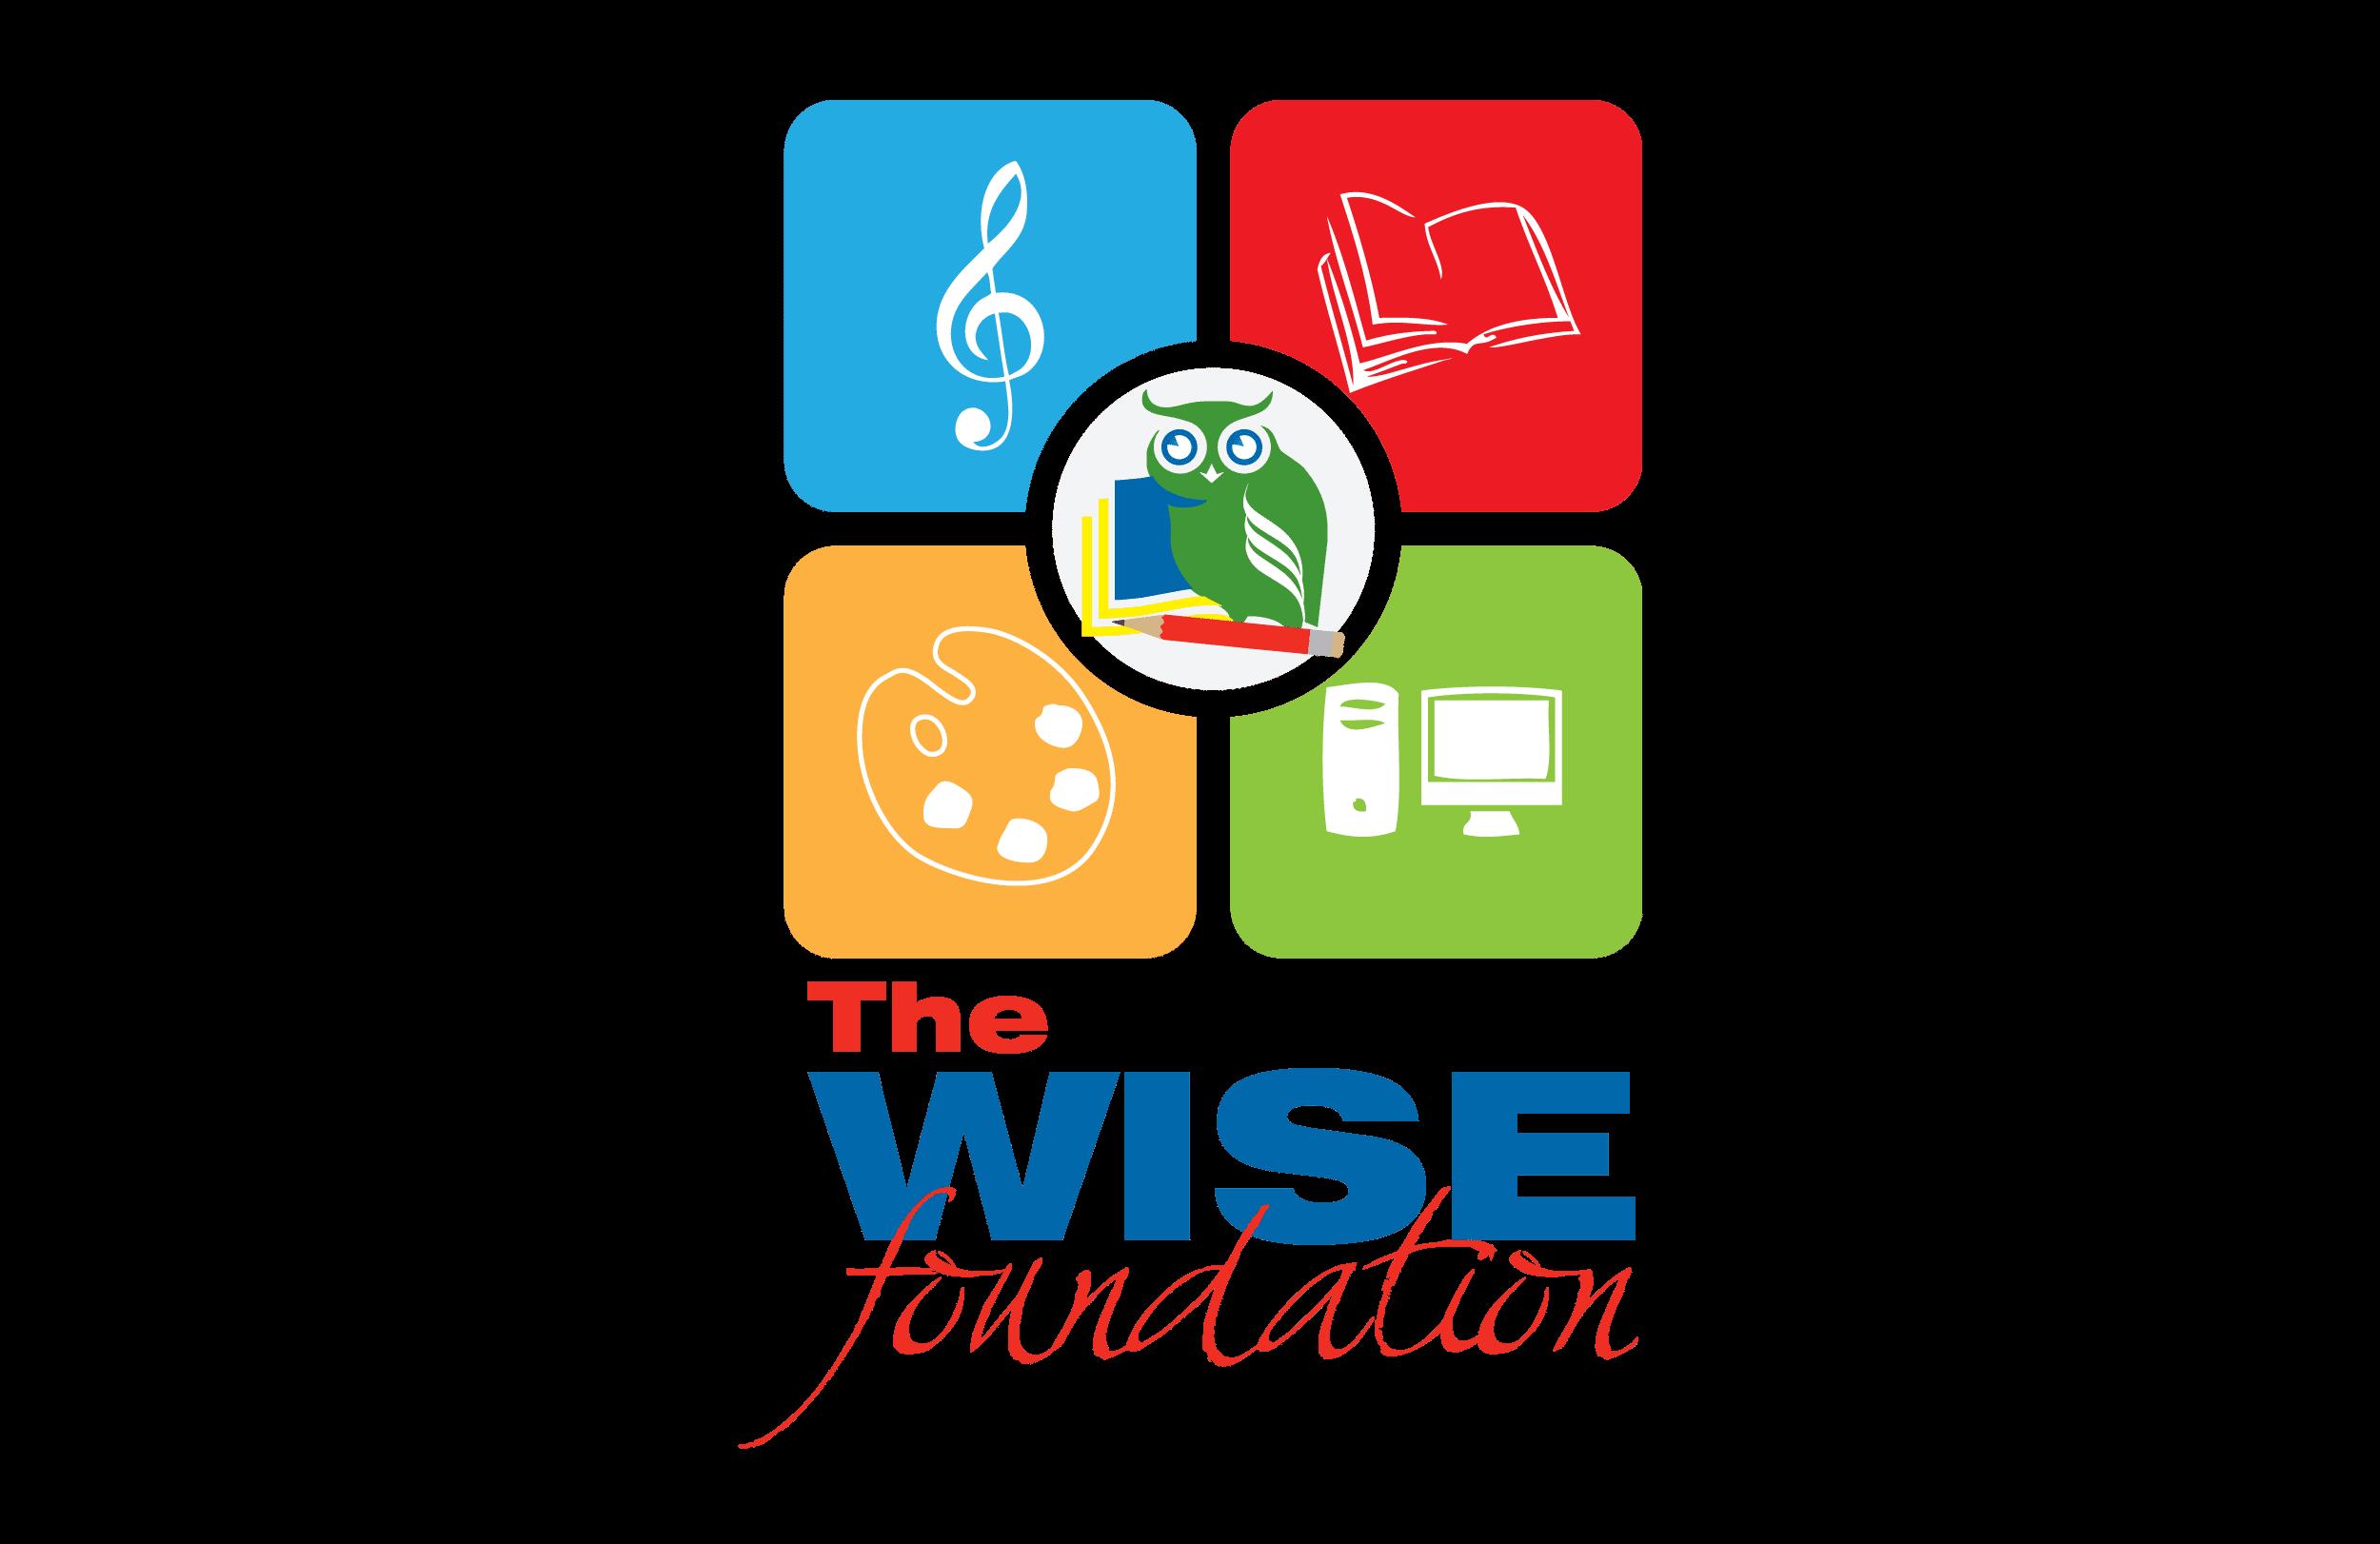 hello-ortho-philanthropy-logos-the-wise-foundation